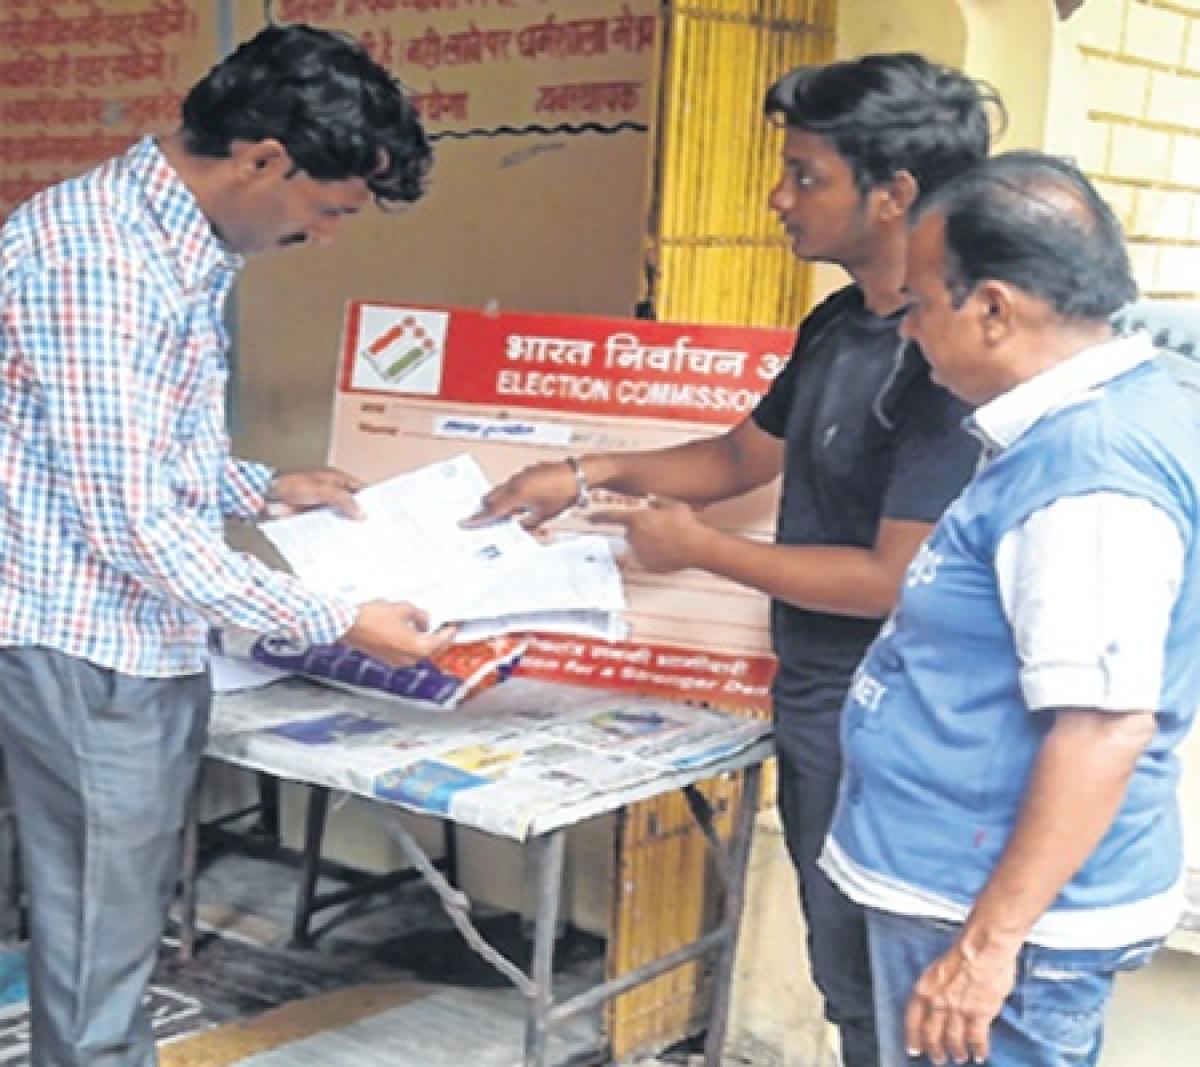 Ujjain: 18-year-old denied electoral registration, files plaint with ECI, EC